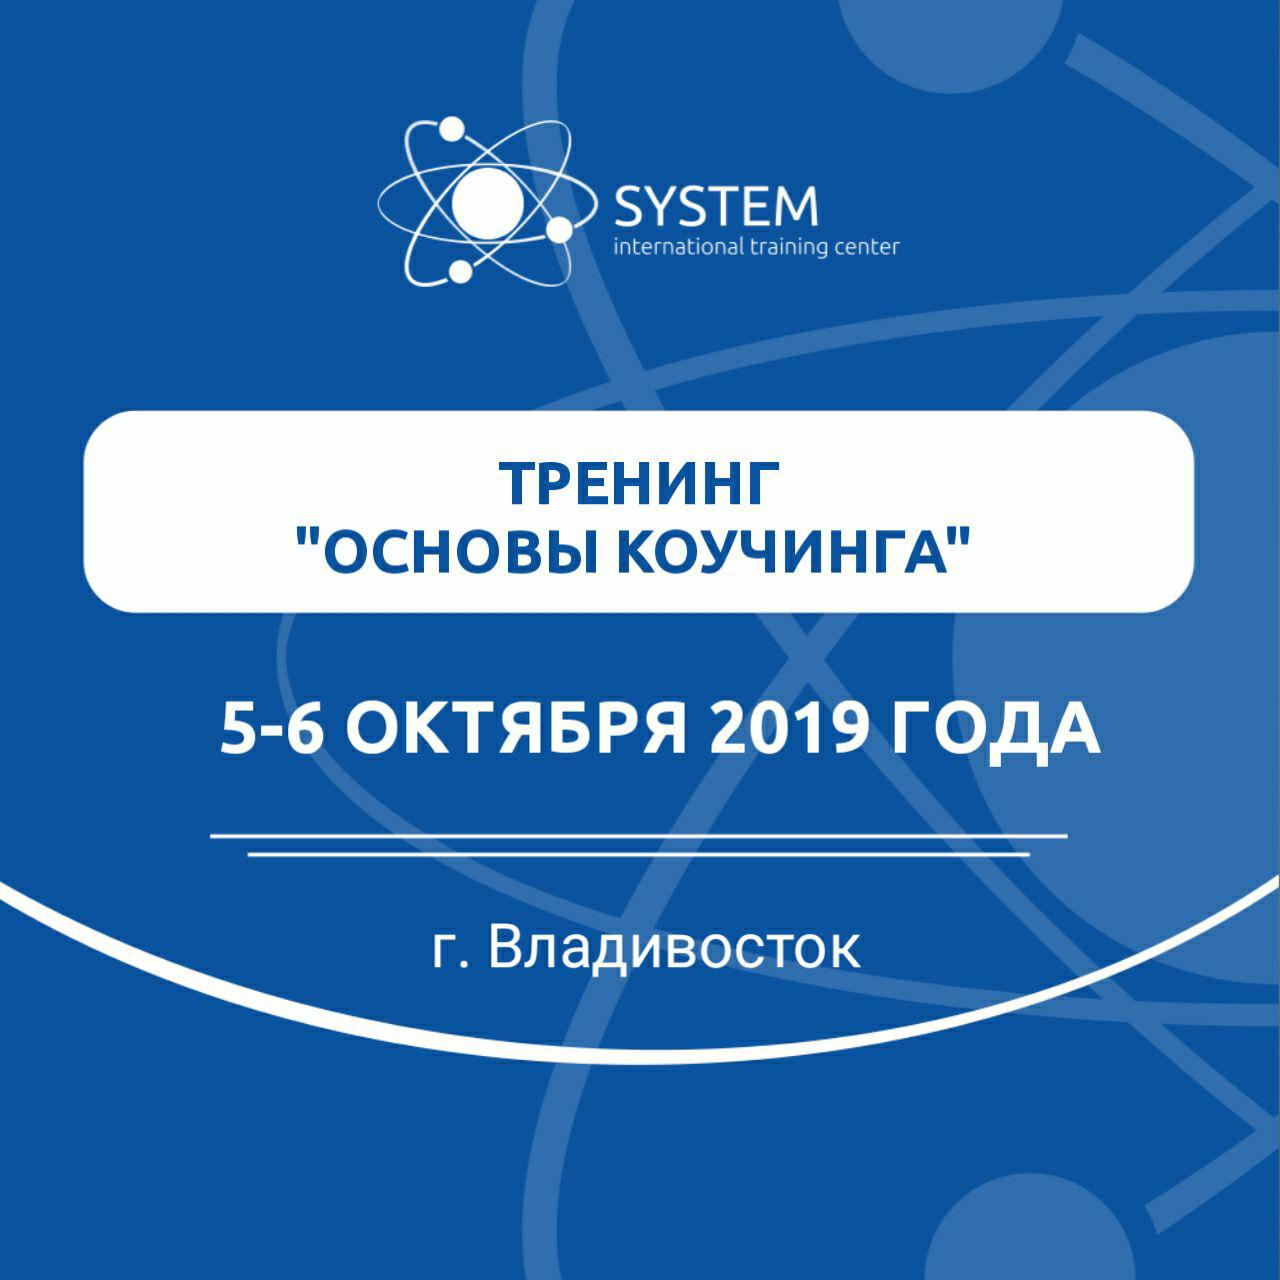 Тренинг «Основы коучинга» @ г. Владивосток, ул. Жигура 26а, этаж 2, ауд. 2-7, БЦ «Seven»